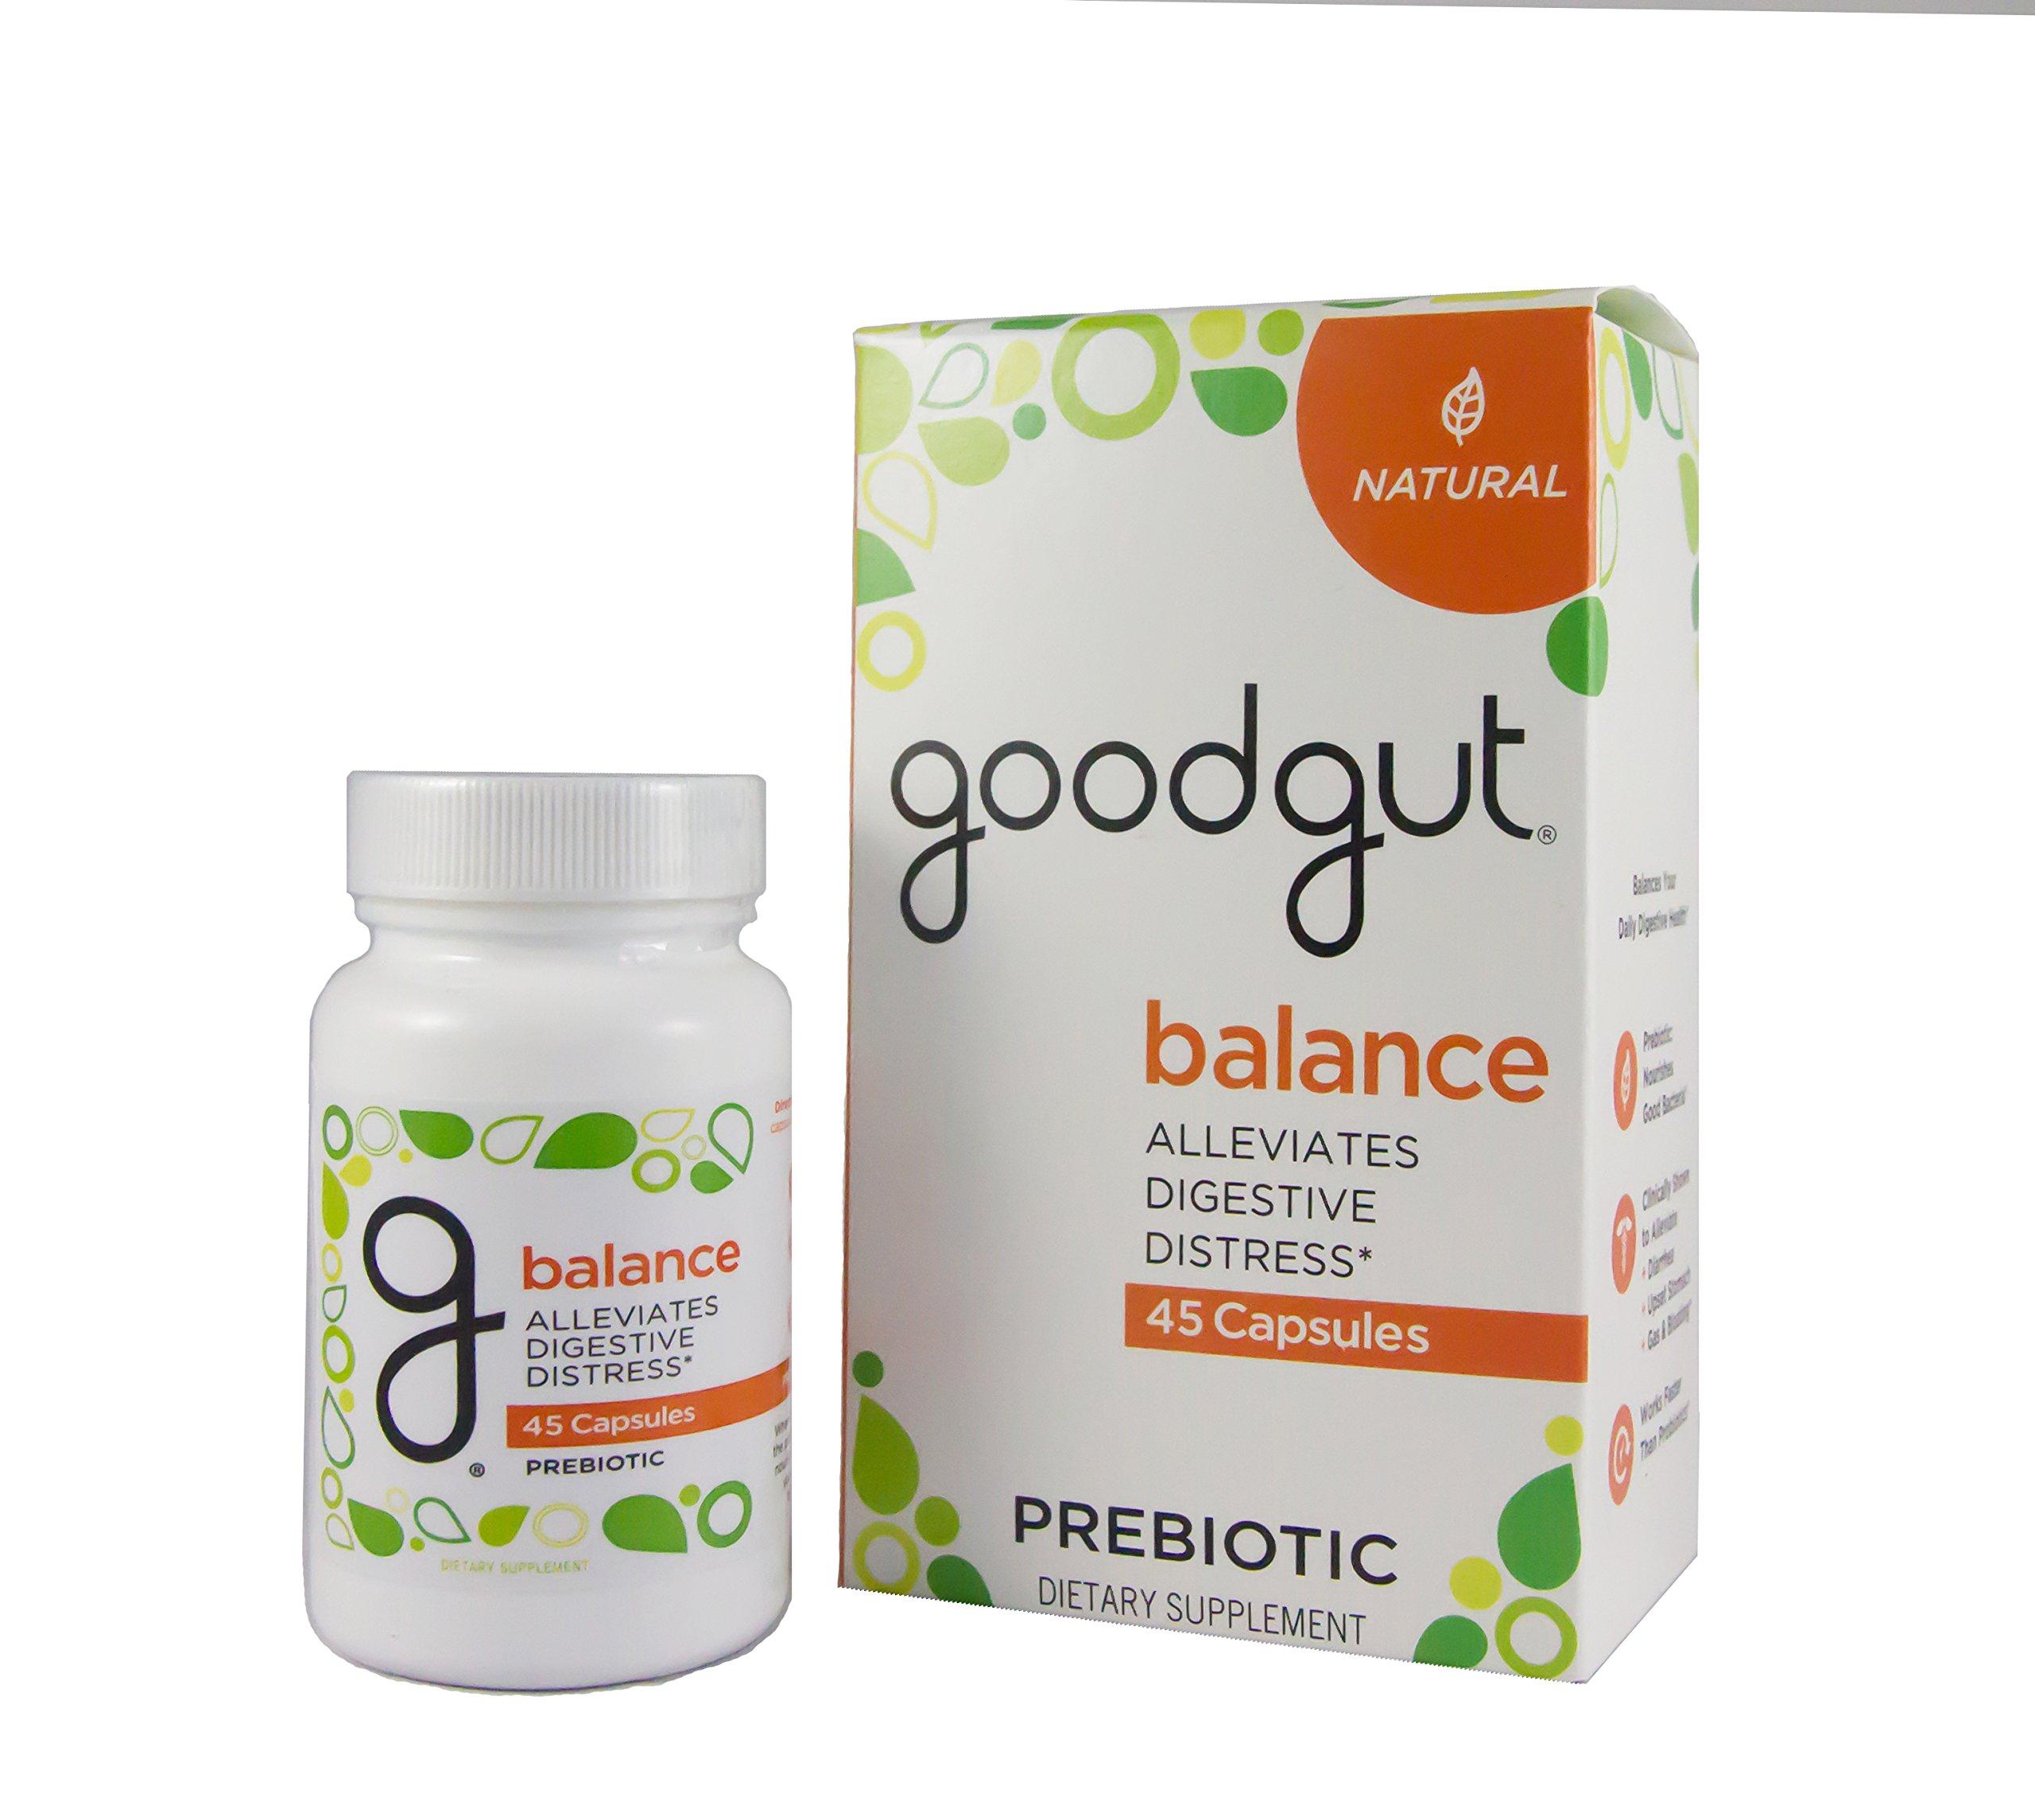 Goodgut Balance Daily Prebiotic Supplement (45) by Good Gut